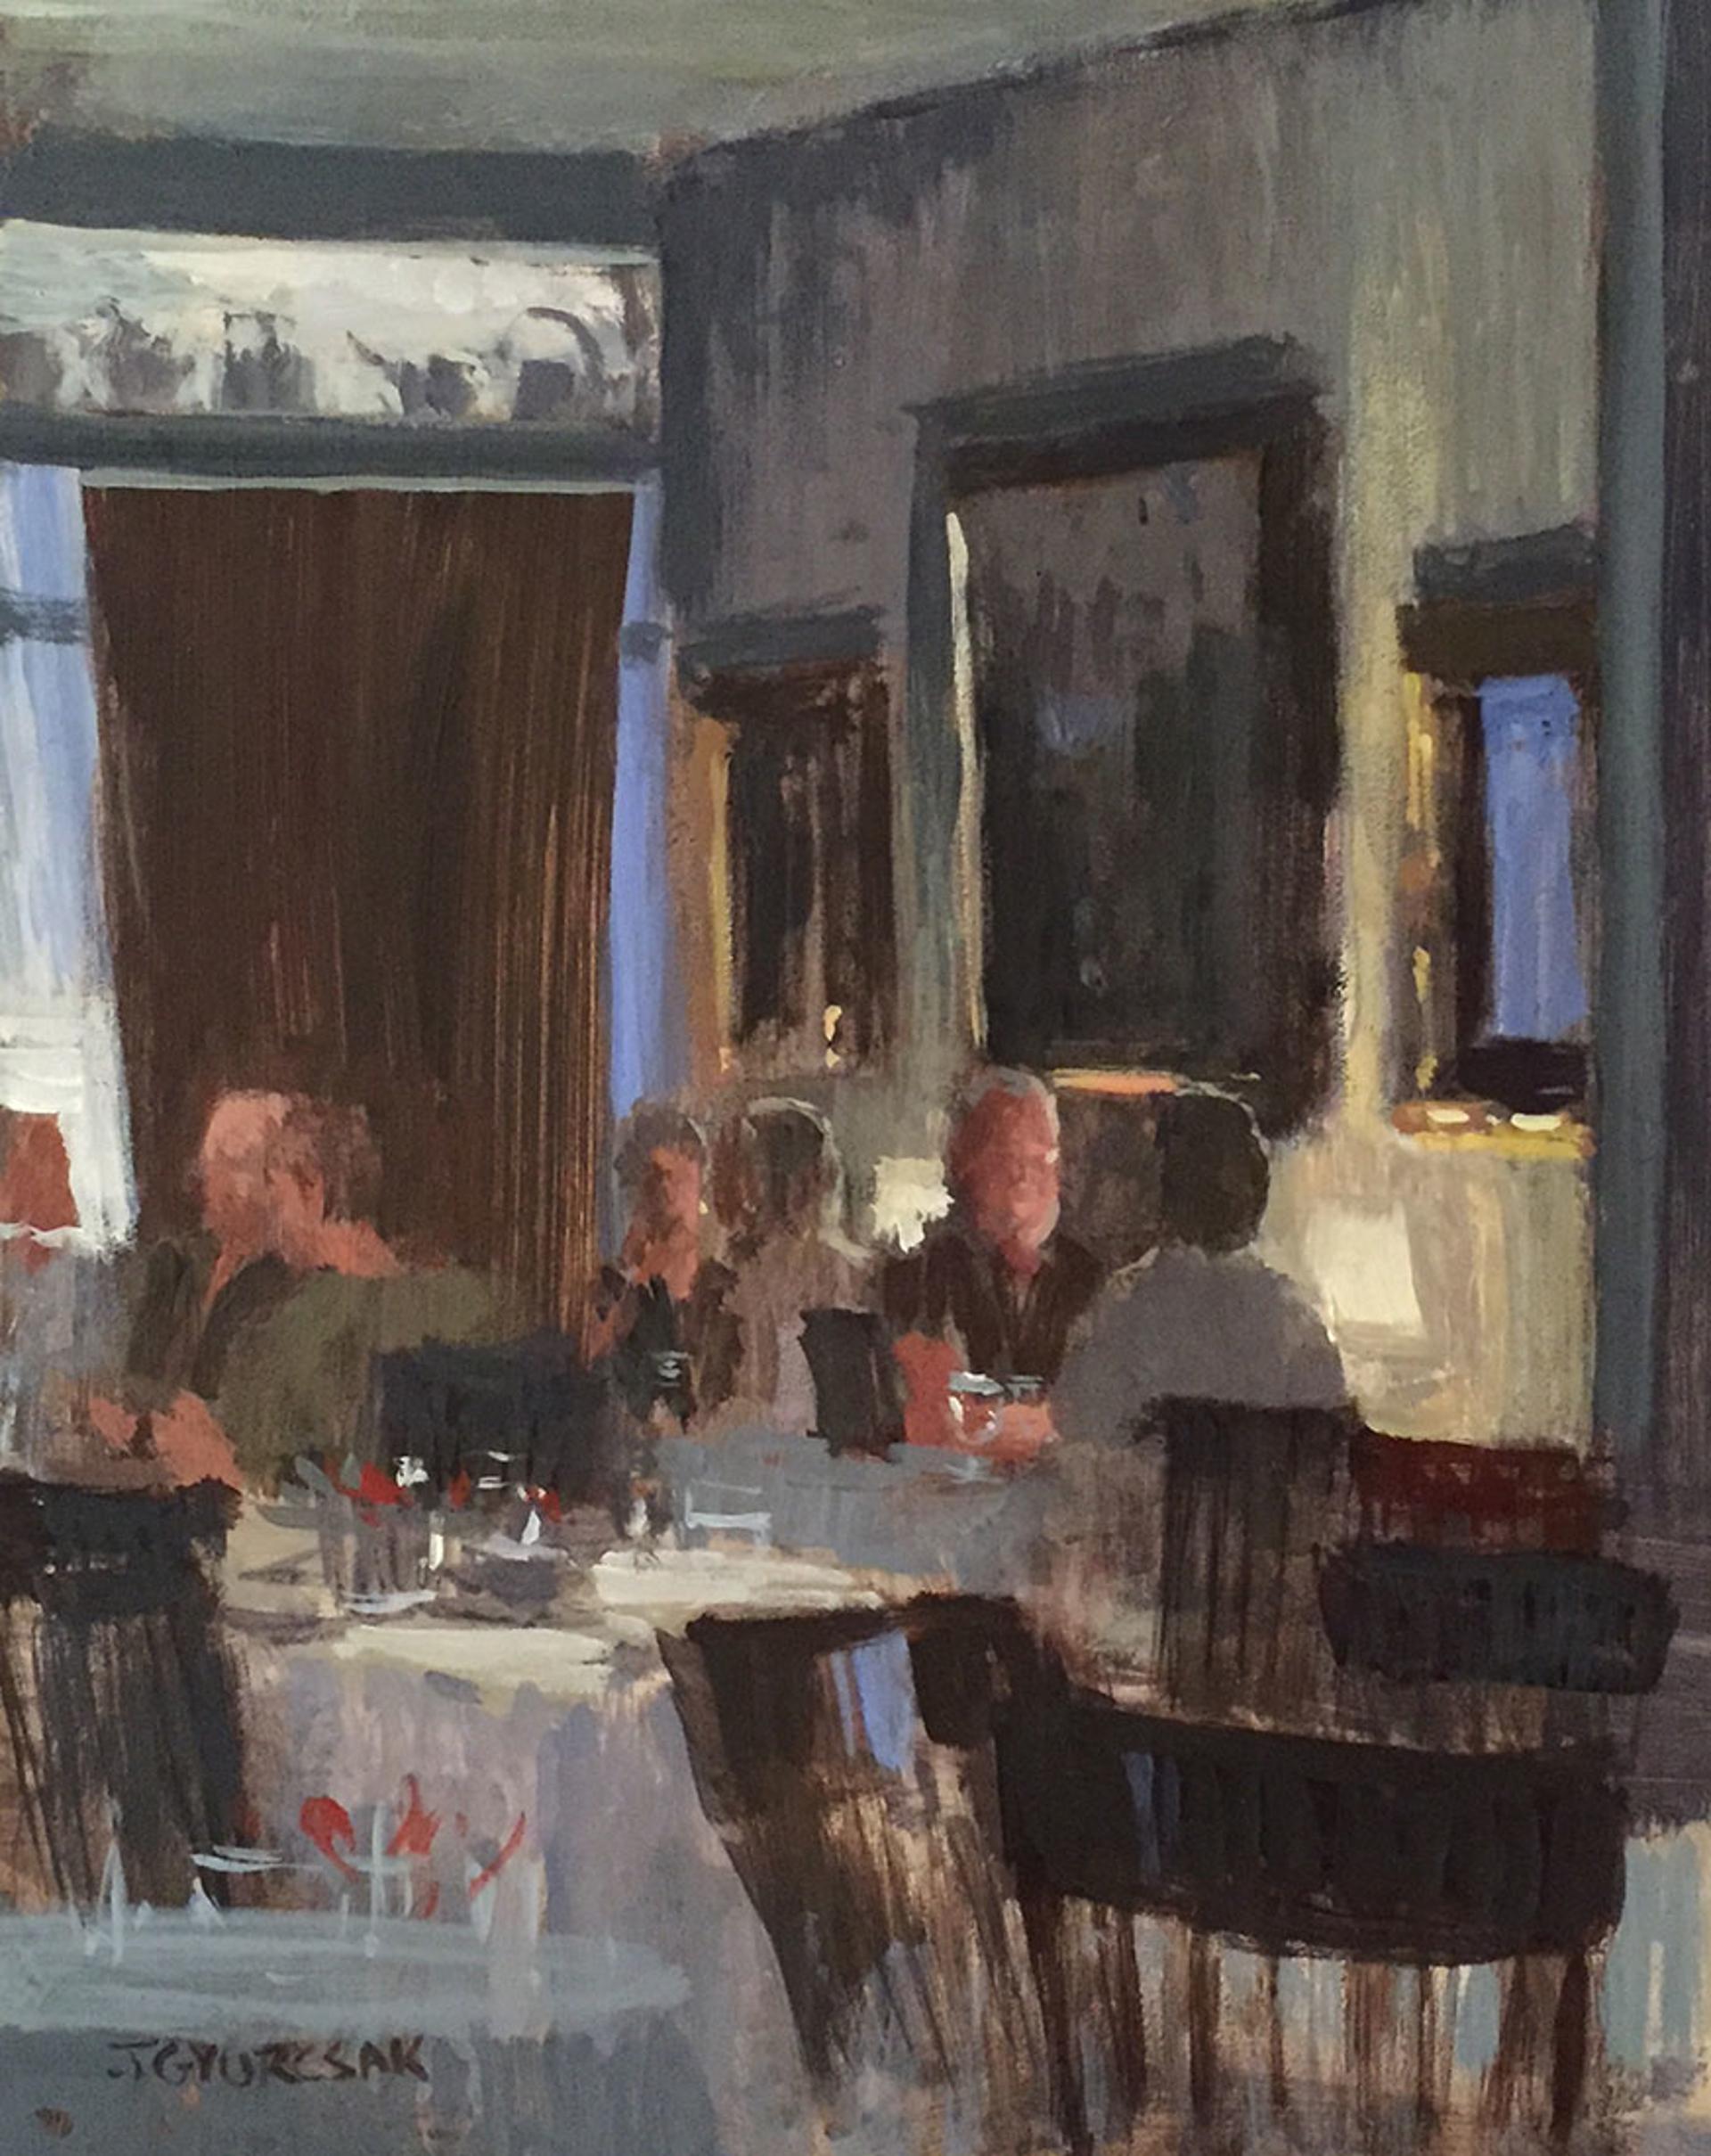 Evening Conversation by Joe Gyurcsak